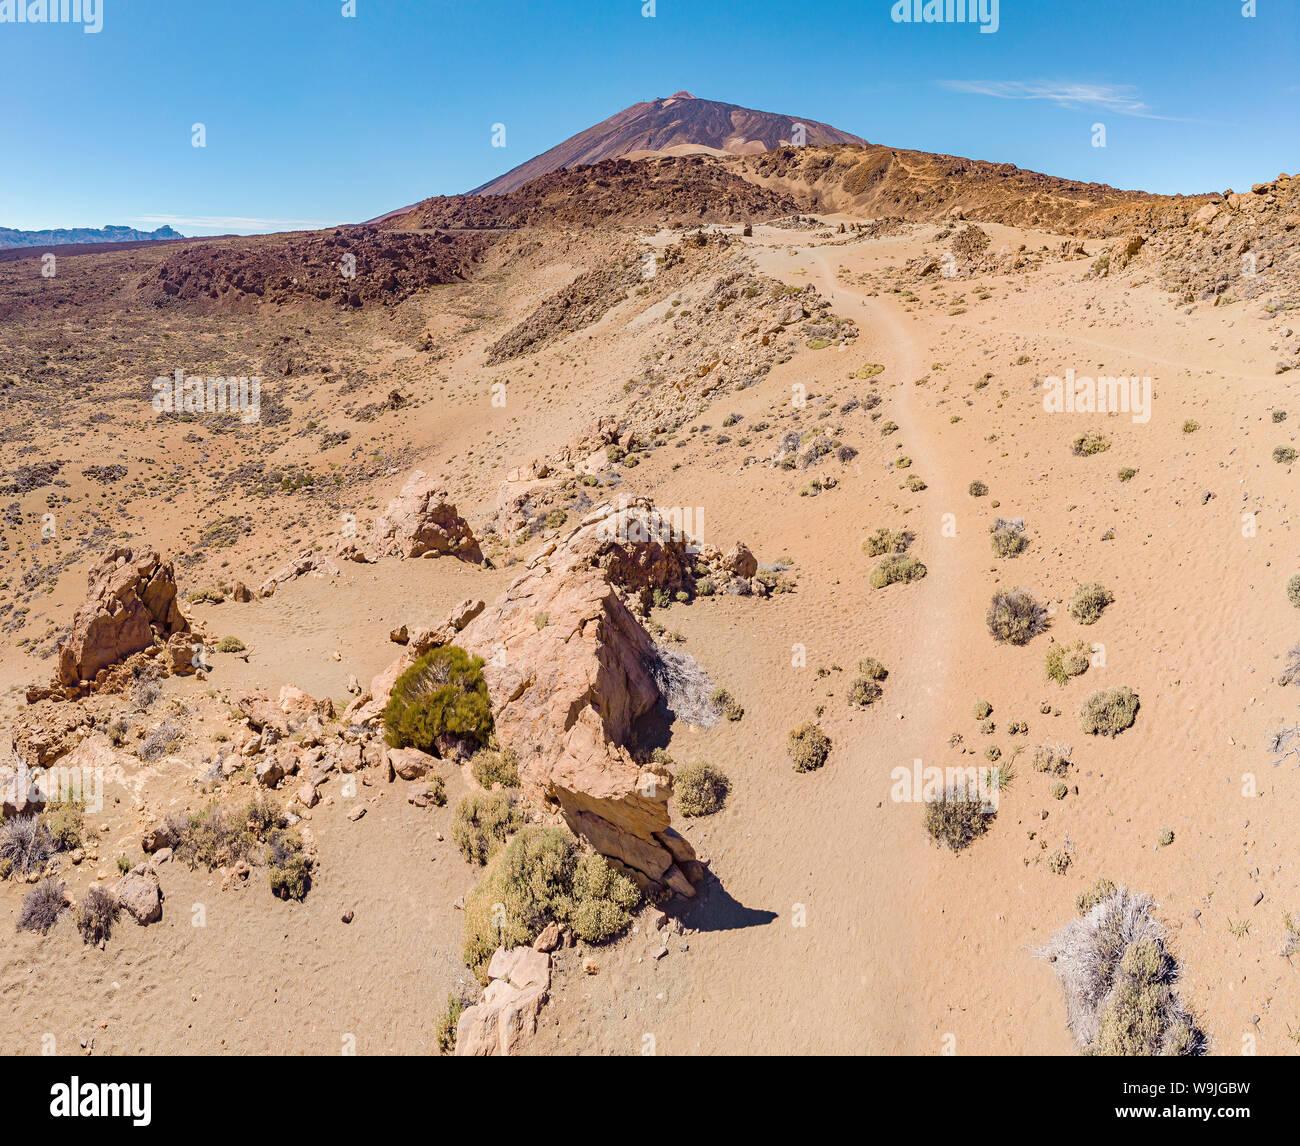 Minas de San Jose, El Teide, La Orotava, Santa Cruz de Tenerife, Islas Canarias, España Tenrife, 30071206 *** título Local *** paisaje, verano Foto de stock